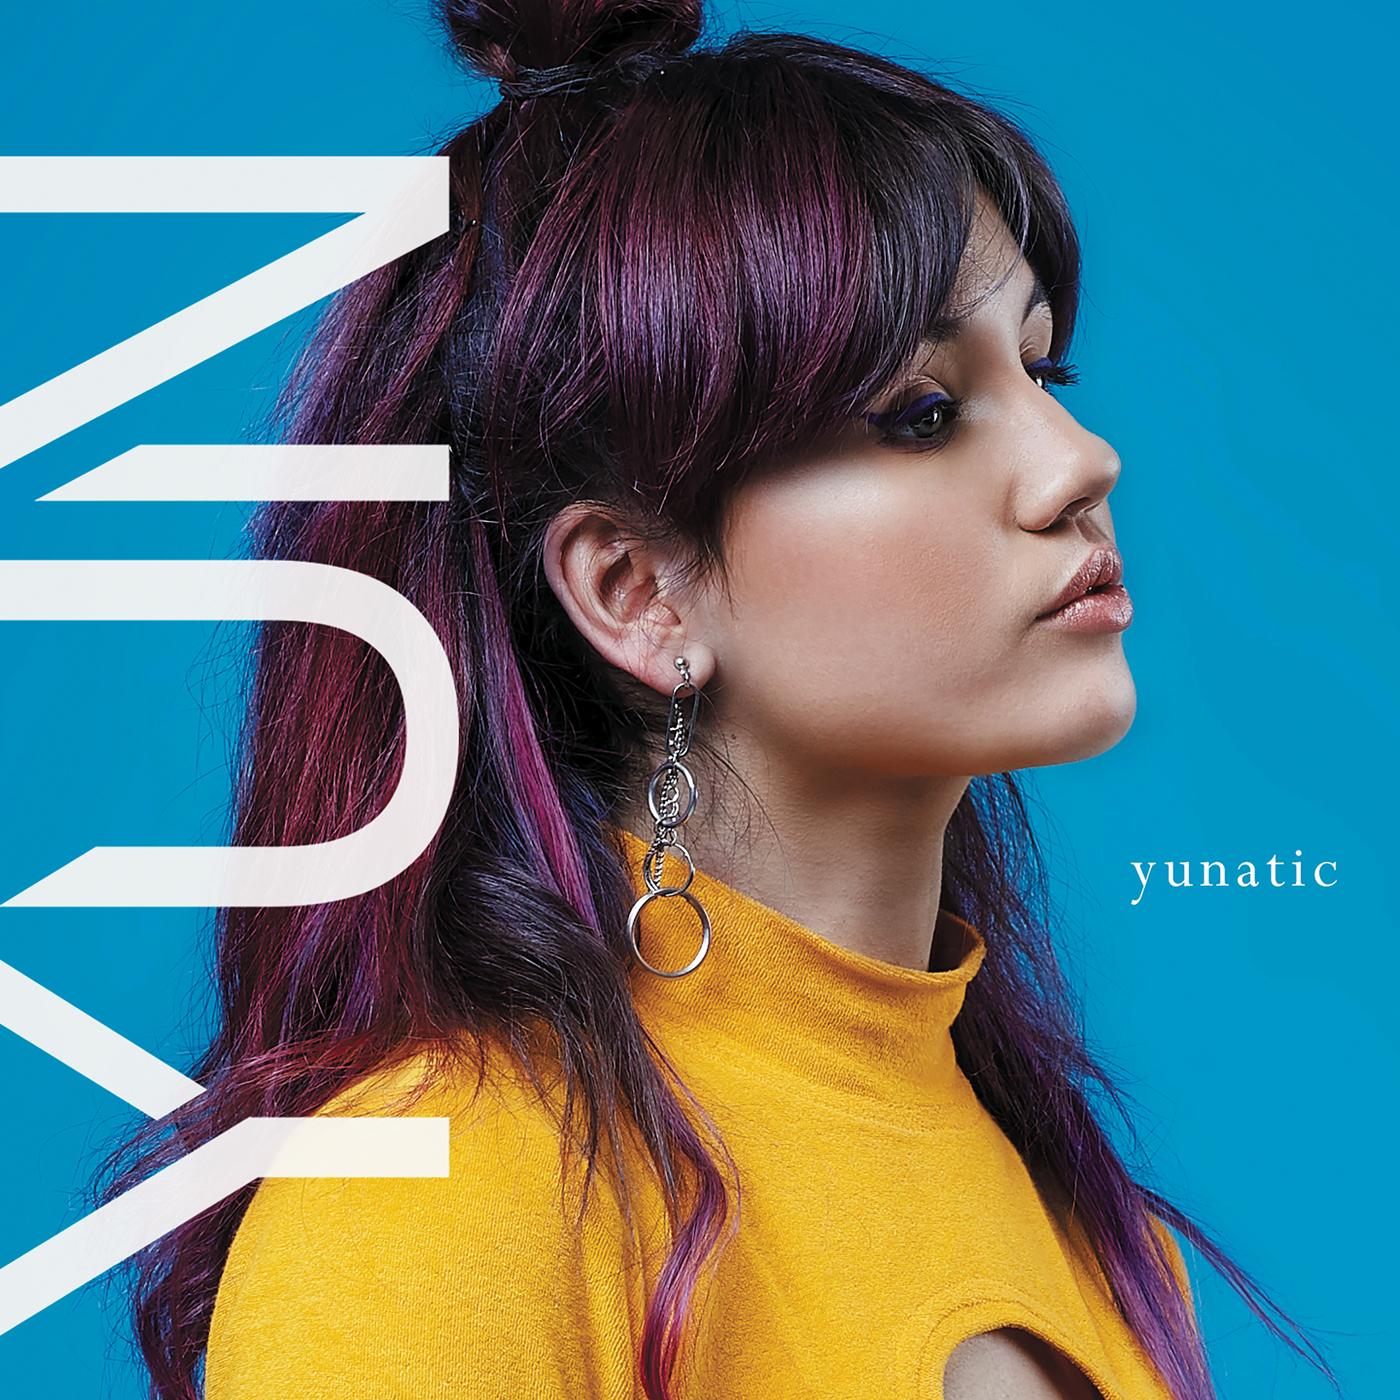 Yunatic - YUN